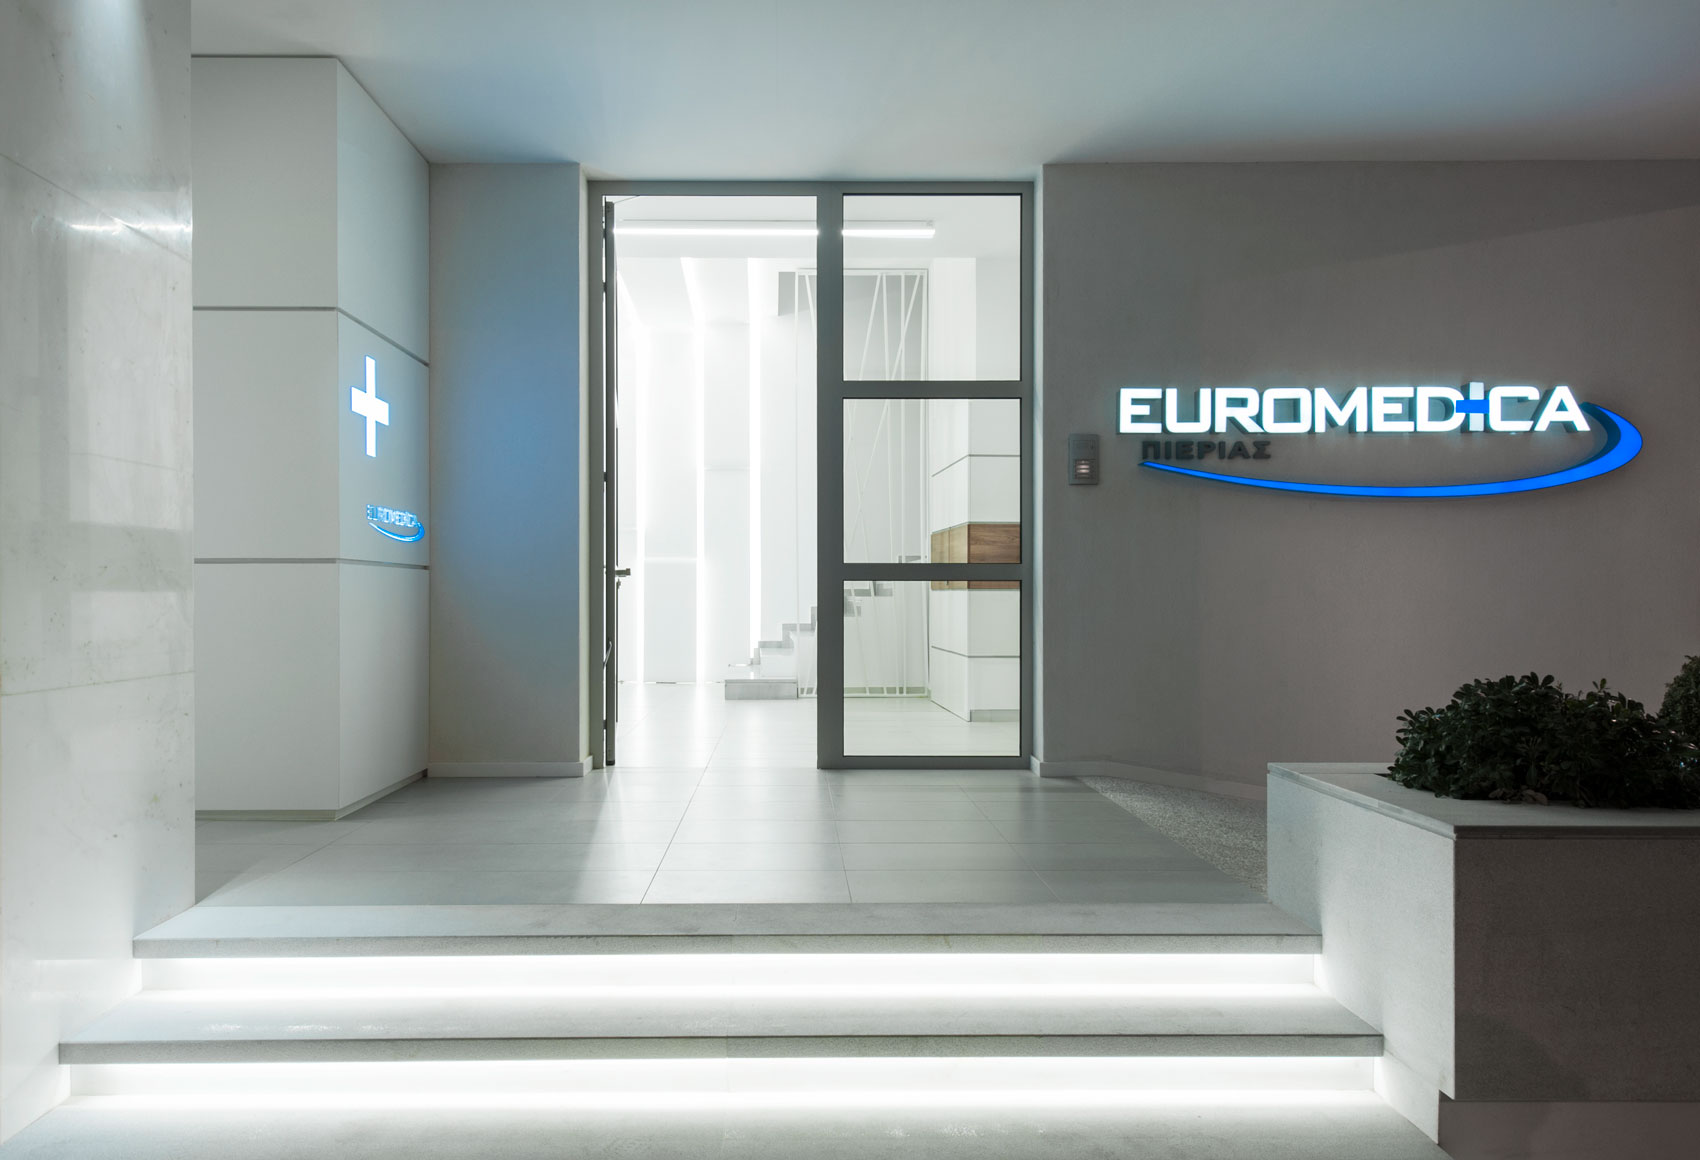 Euromedica 1